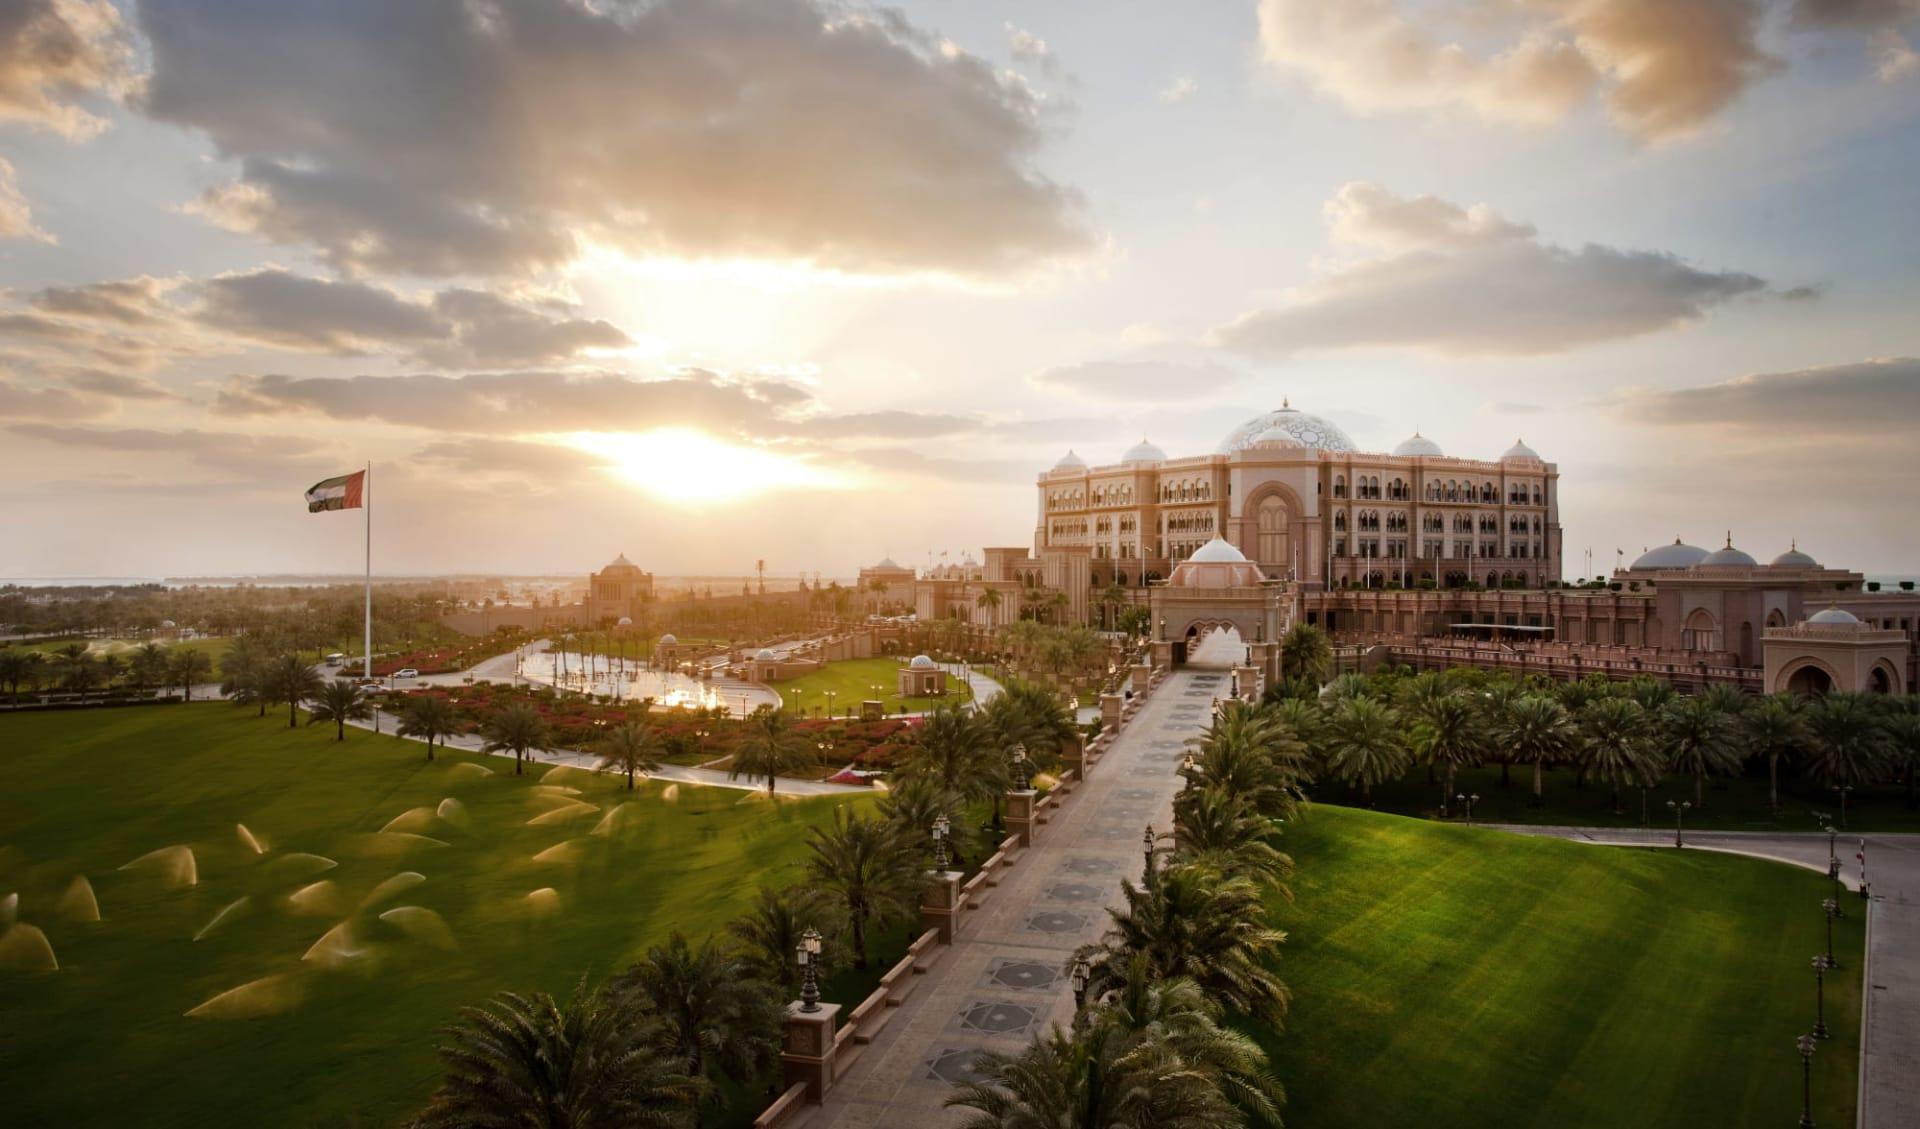 Emirates Palace in Abu Dhabi: